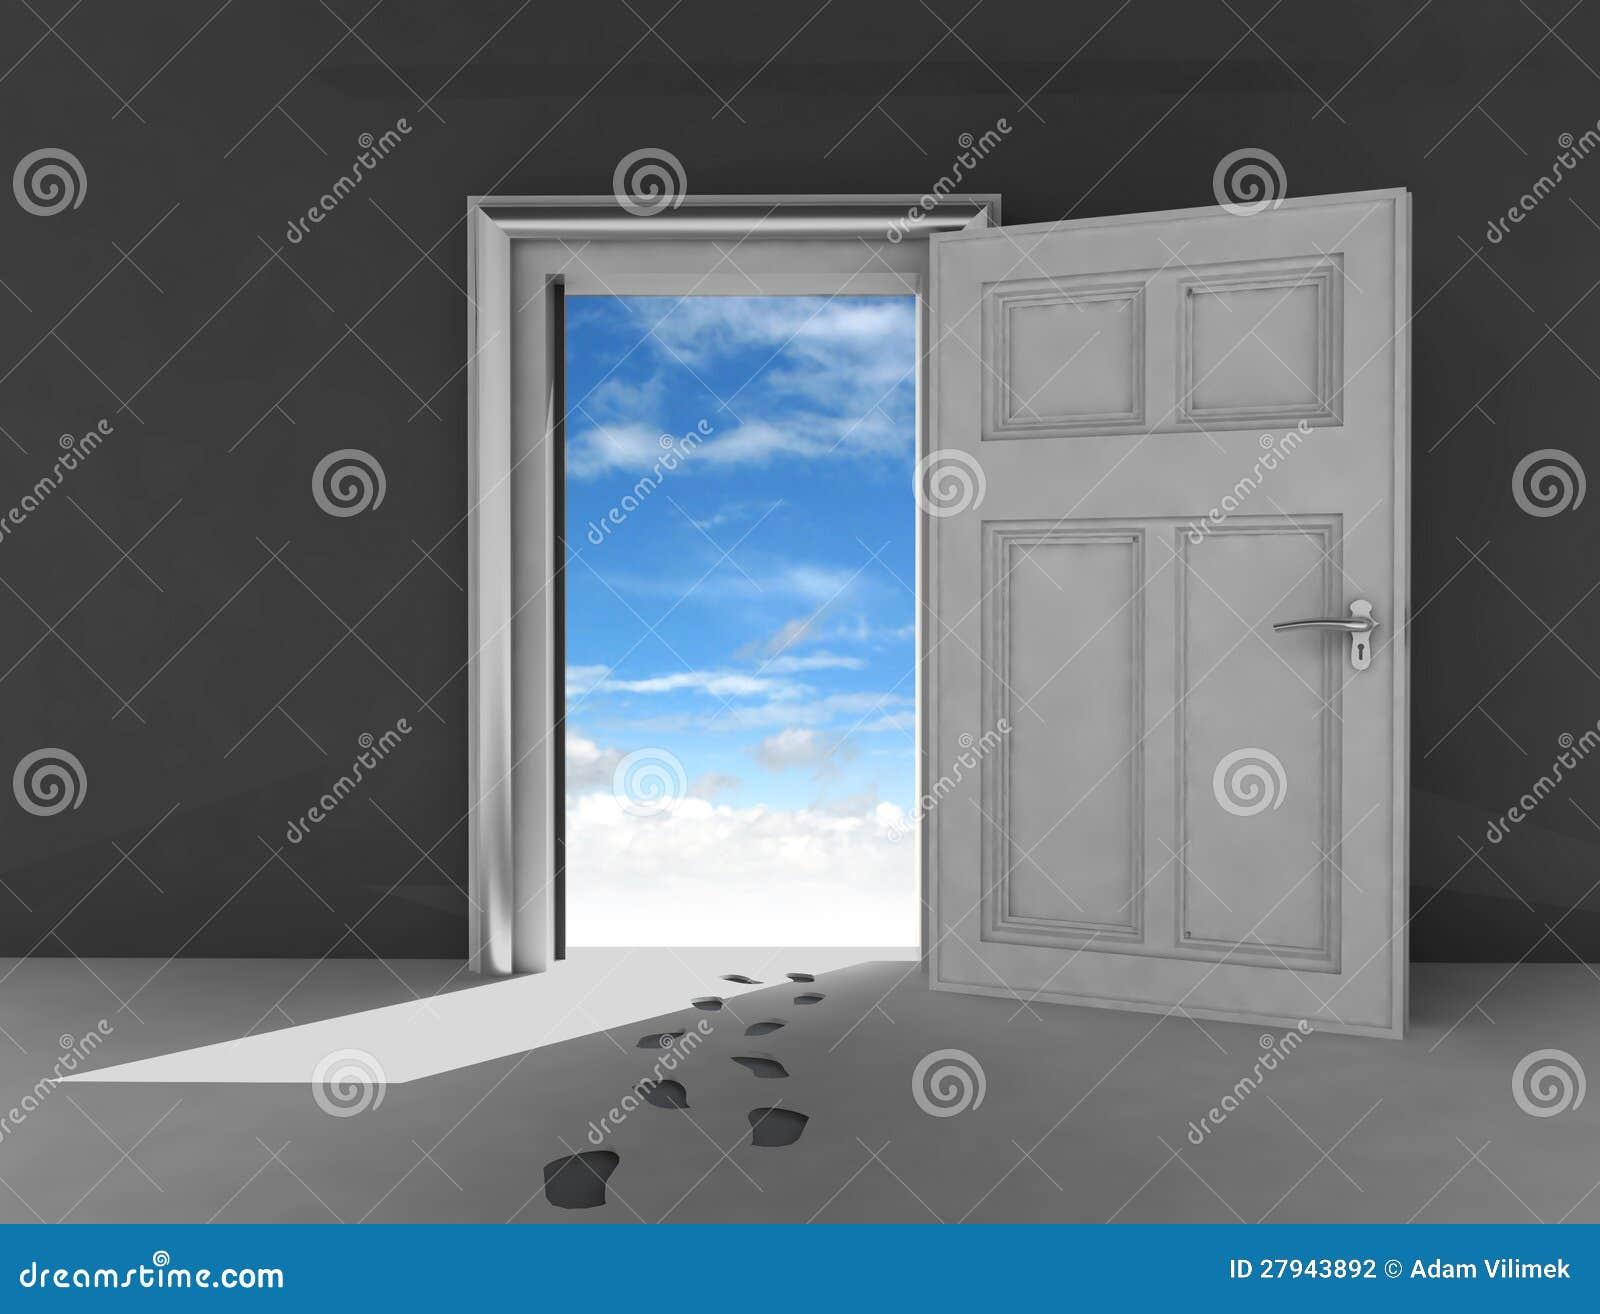 Porte ouverte au ciel avec des empreintes de pas for Porte ouverte